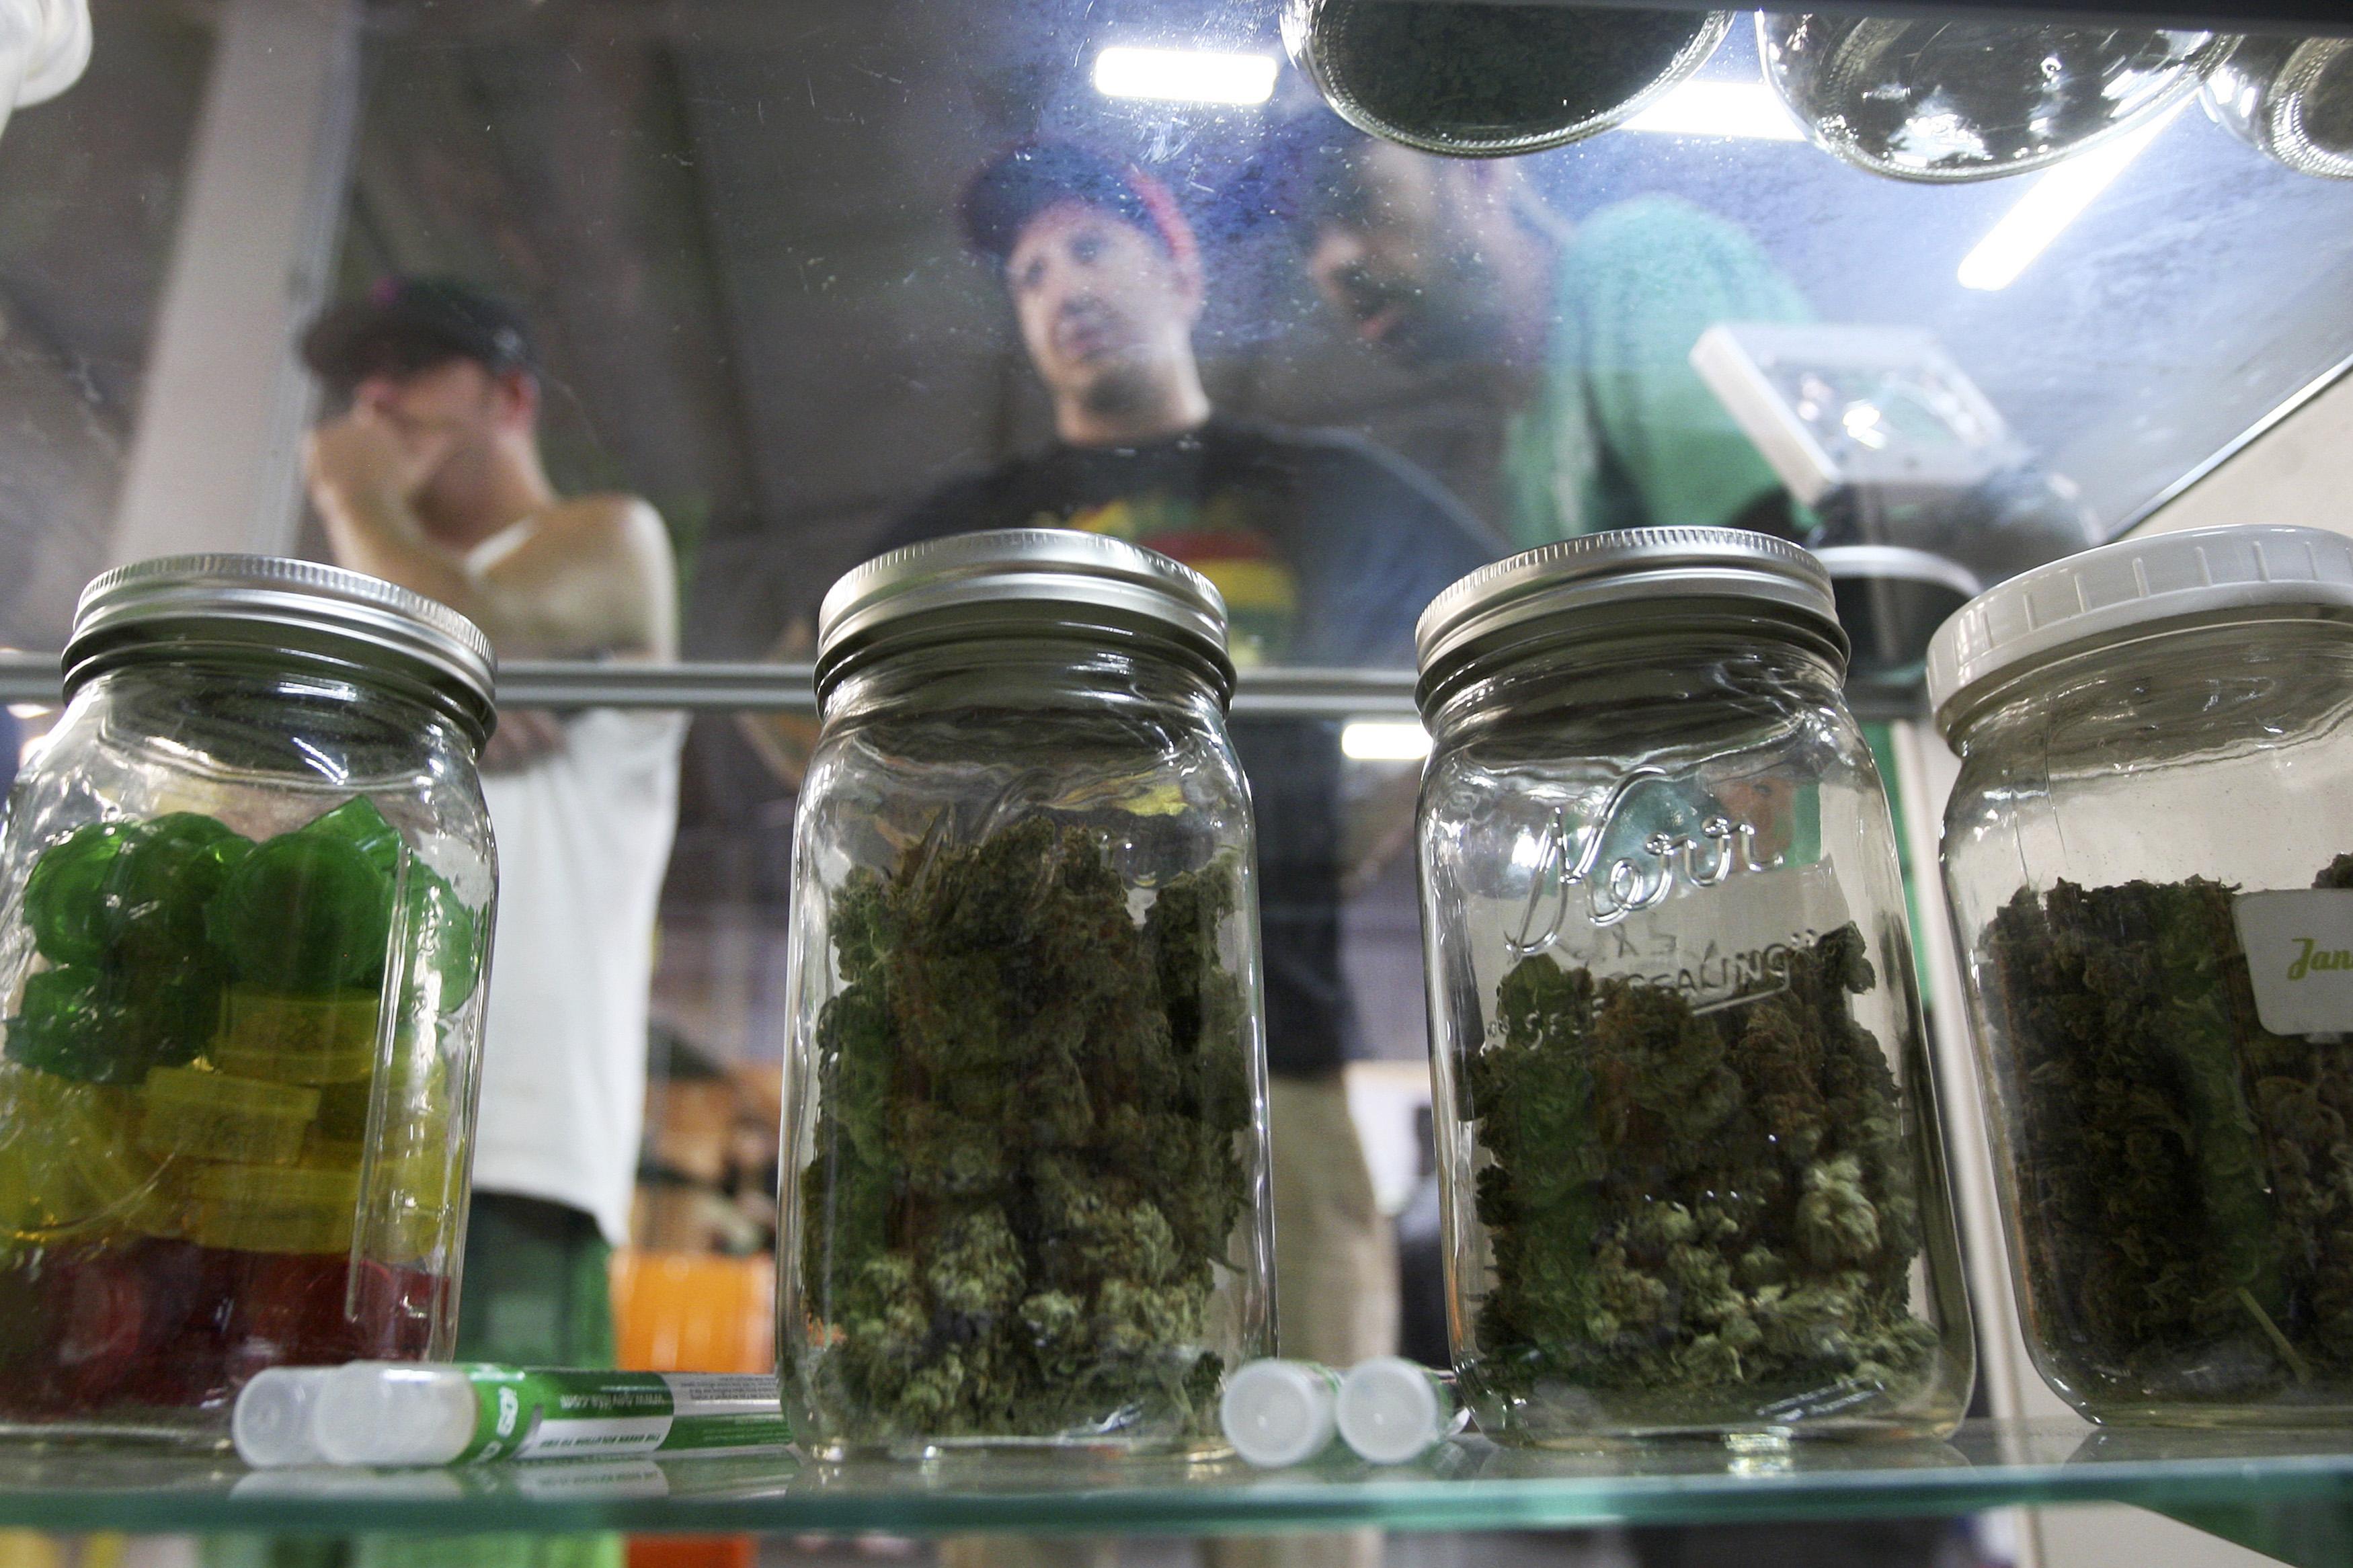 People look at jars of marijuana at the medical marijuana farmers market in Los Angeles